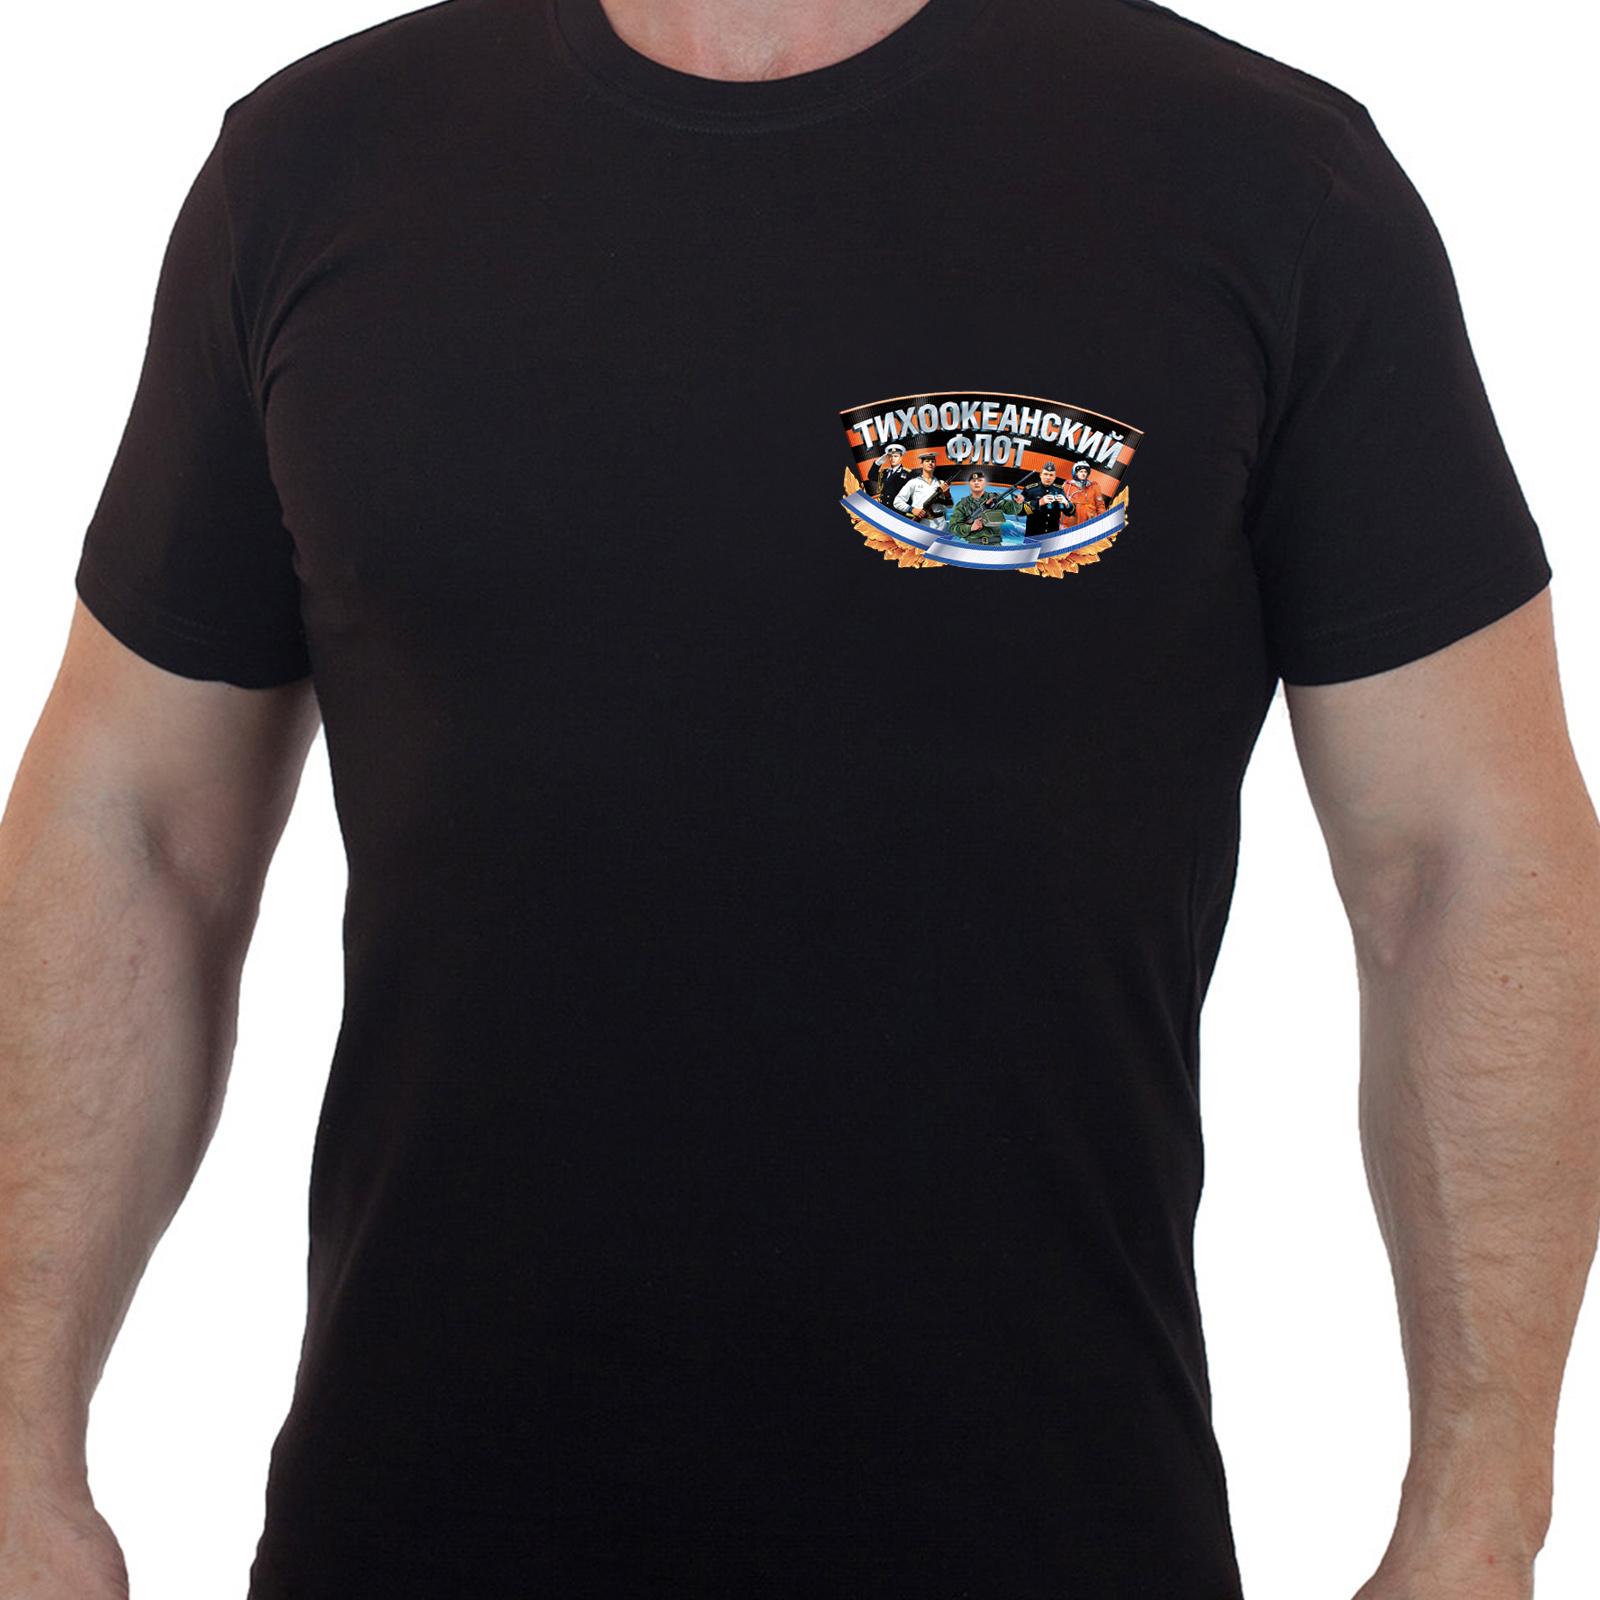 Статусная мужская футболка Тихоокеанский Флот.